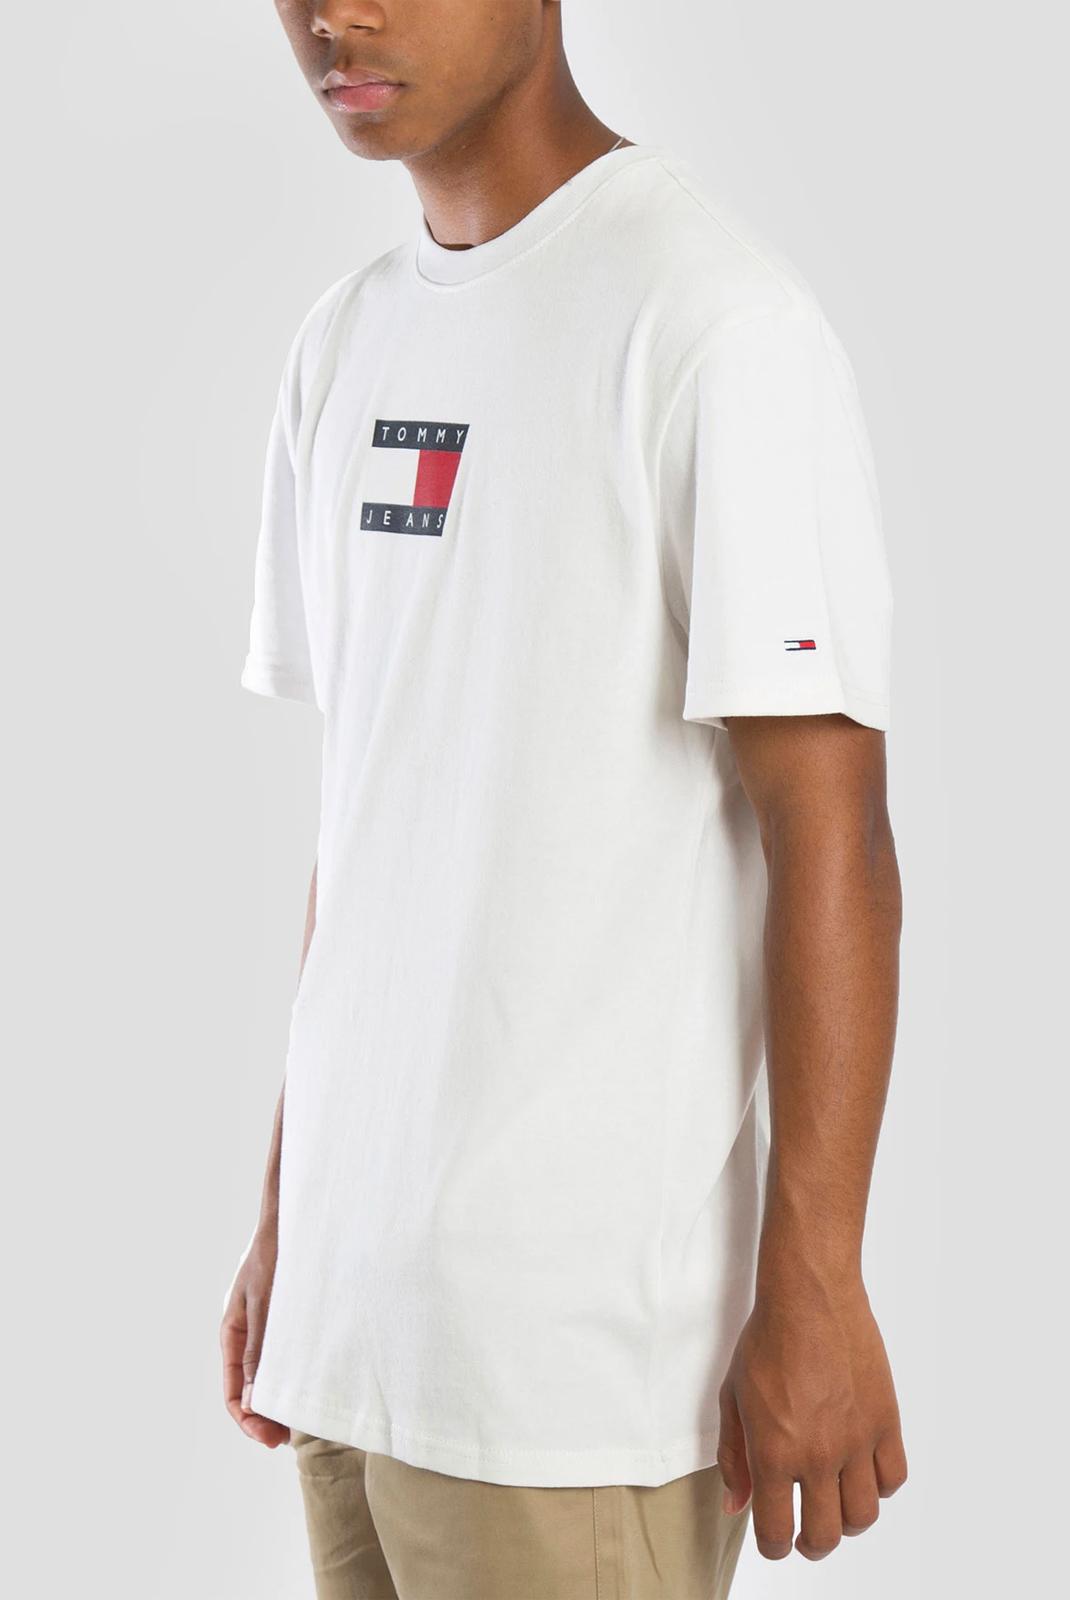 T-S manches courtes  Tommy Jeans DM0DM08351 YBR blanc